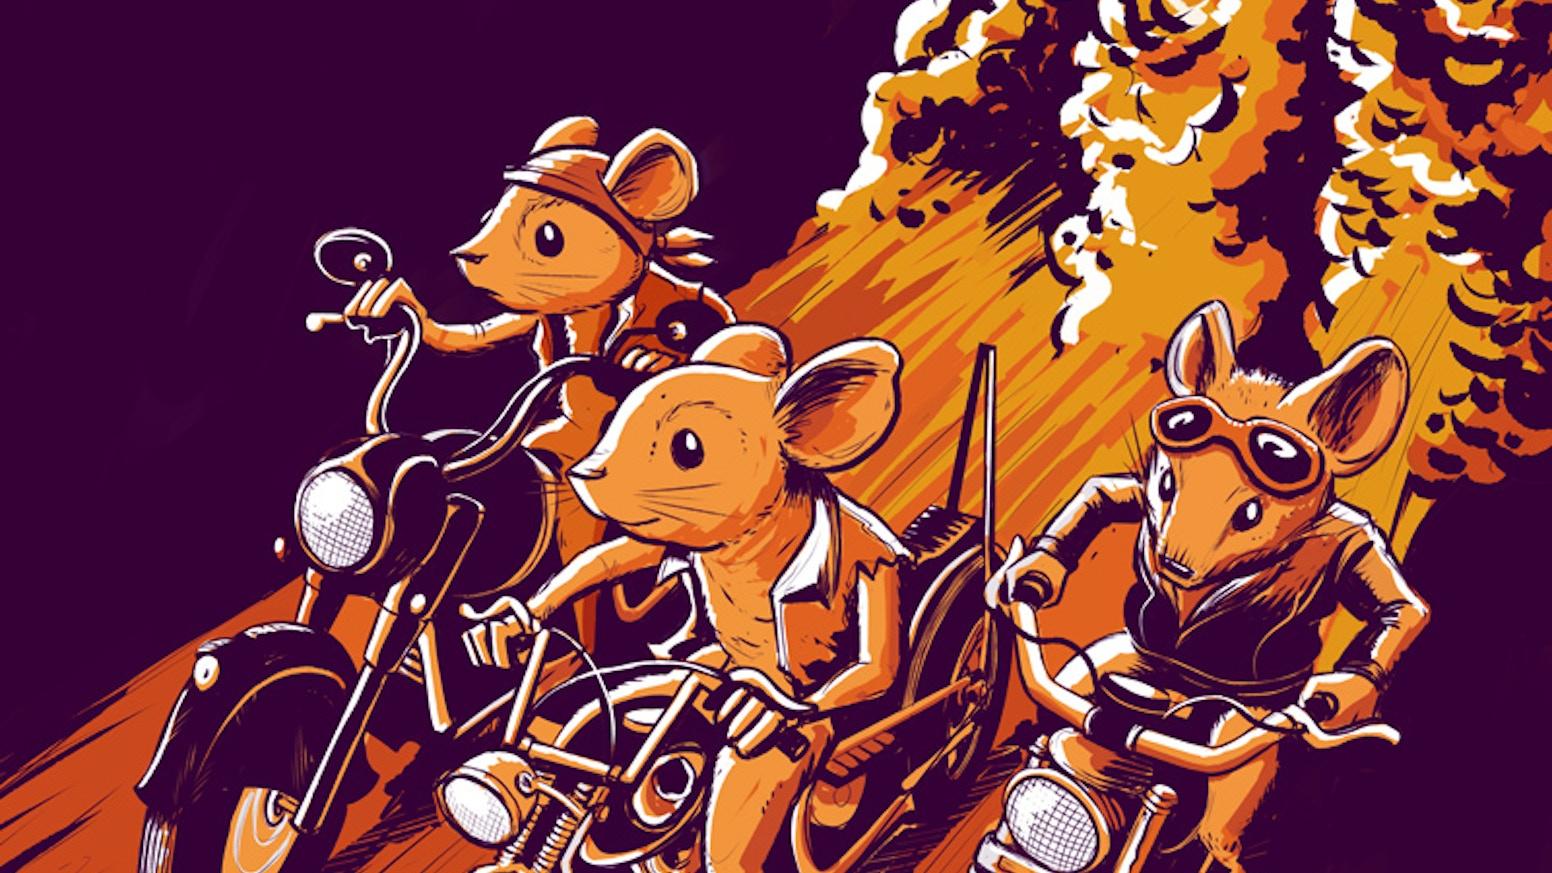 Heavy Metal Thunder Mouse by Derek A. Kamal —Kickstarter